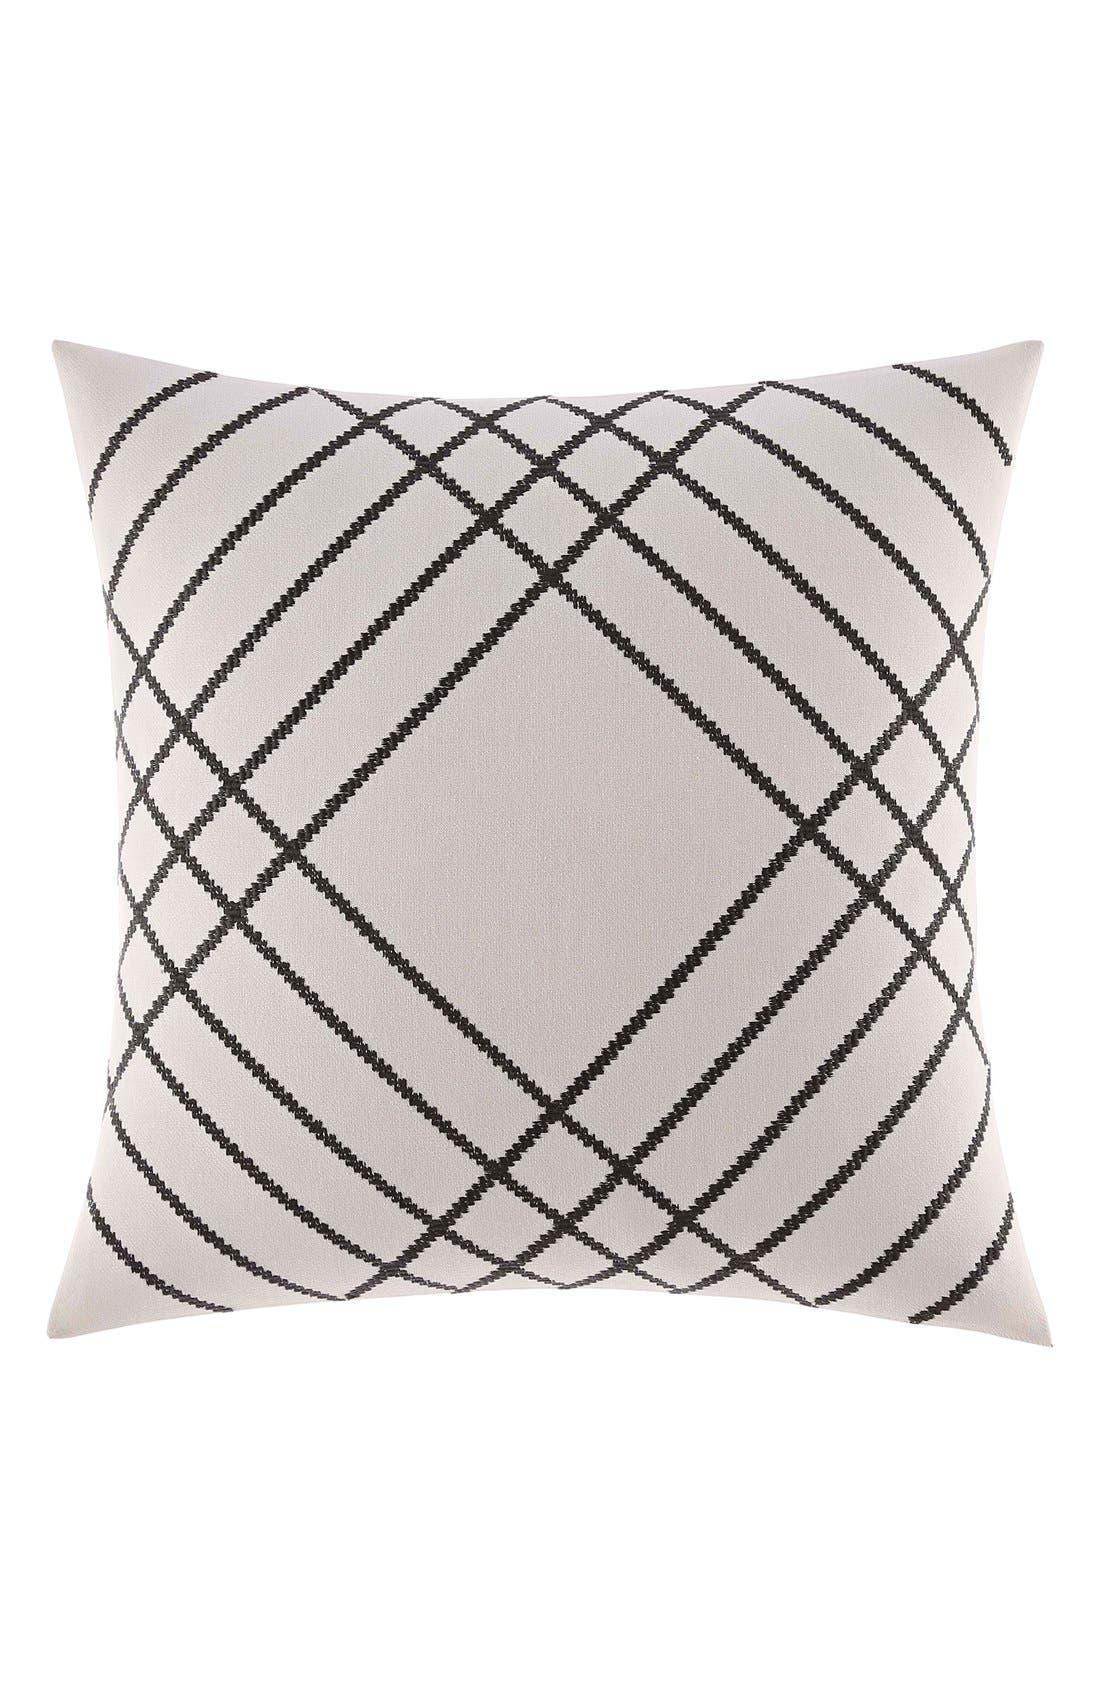 Alternate Image 1 Selected - Nautica 'Chatfield' Pillow